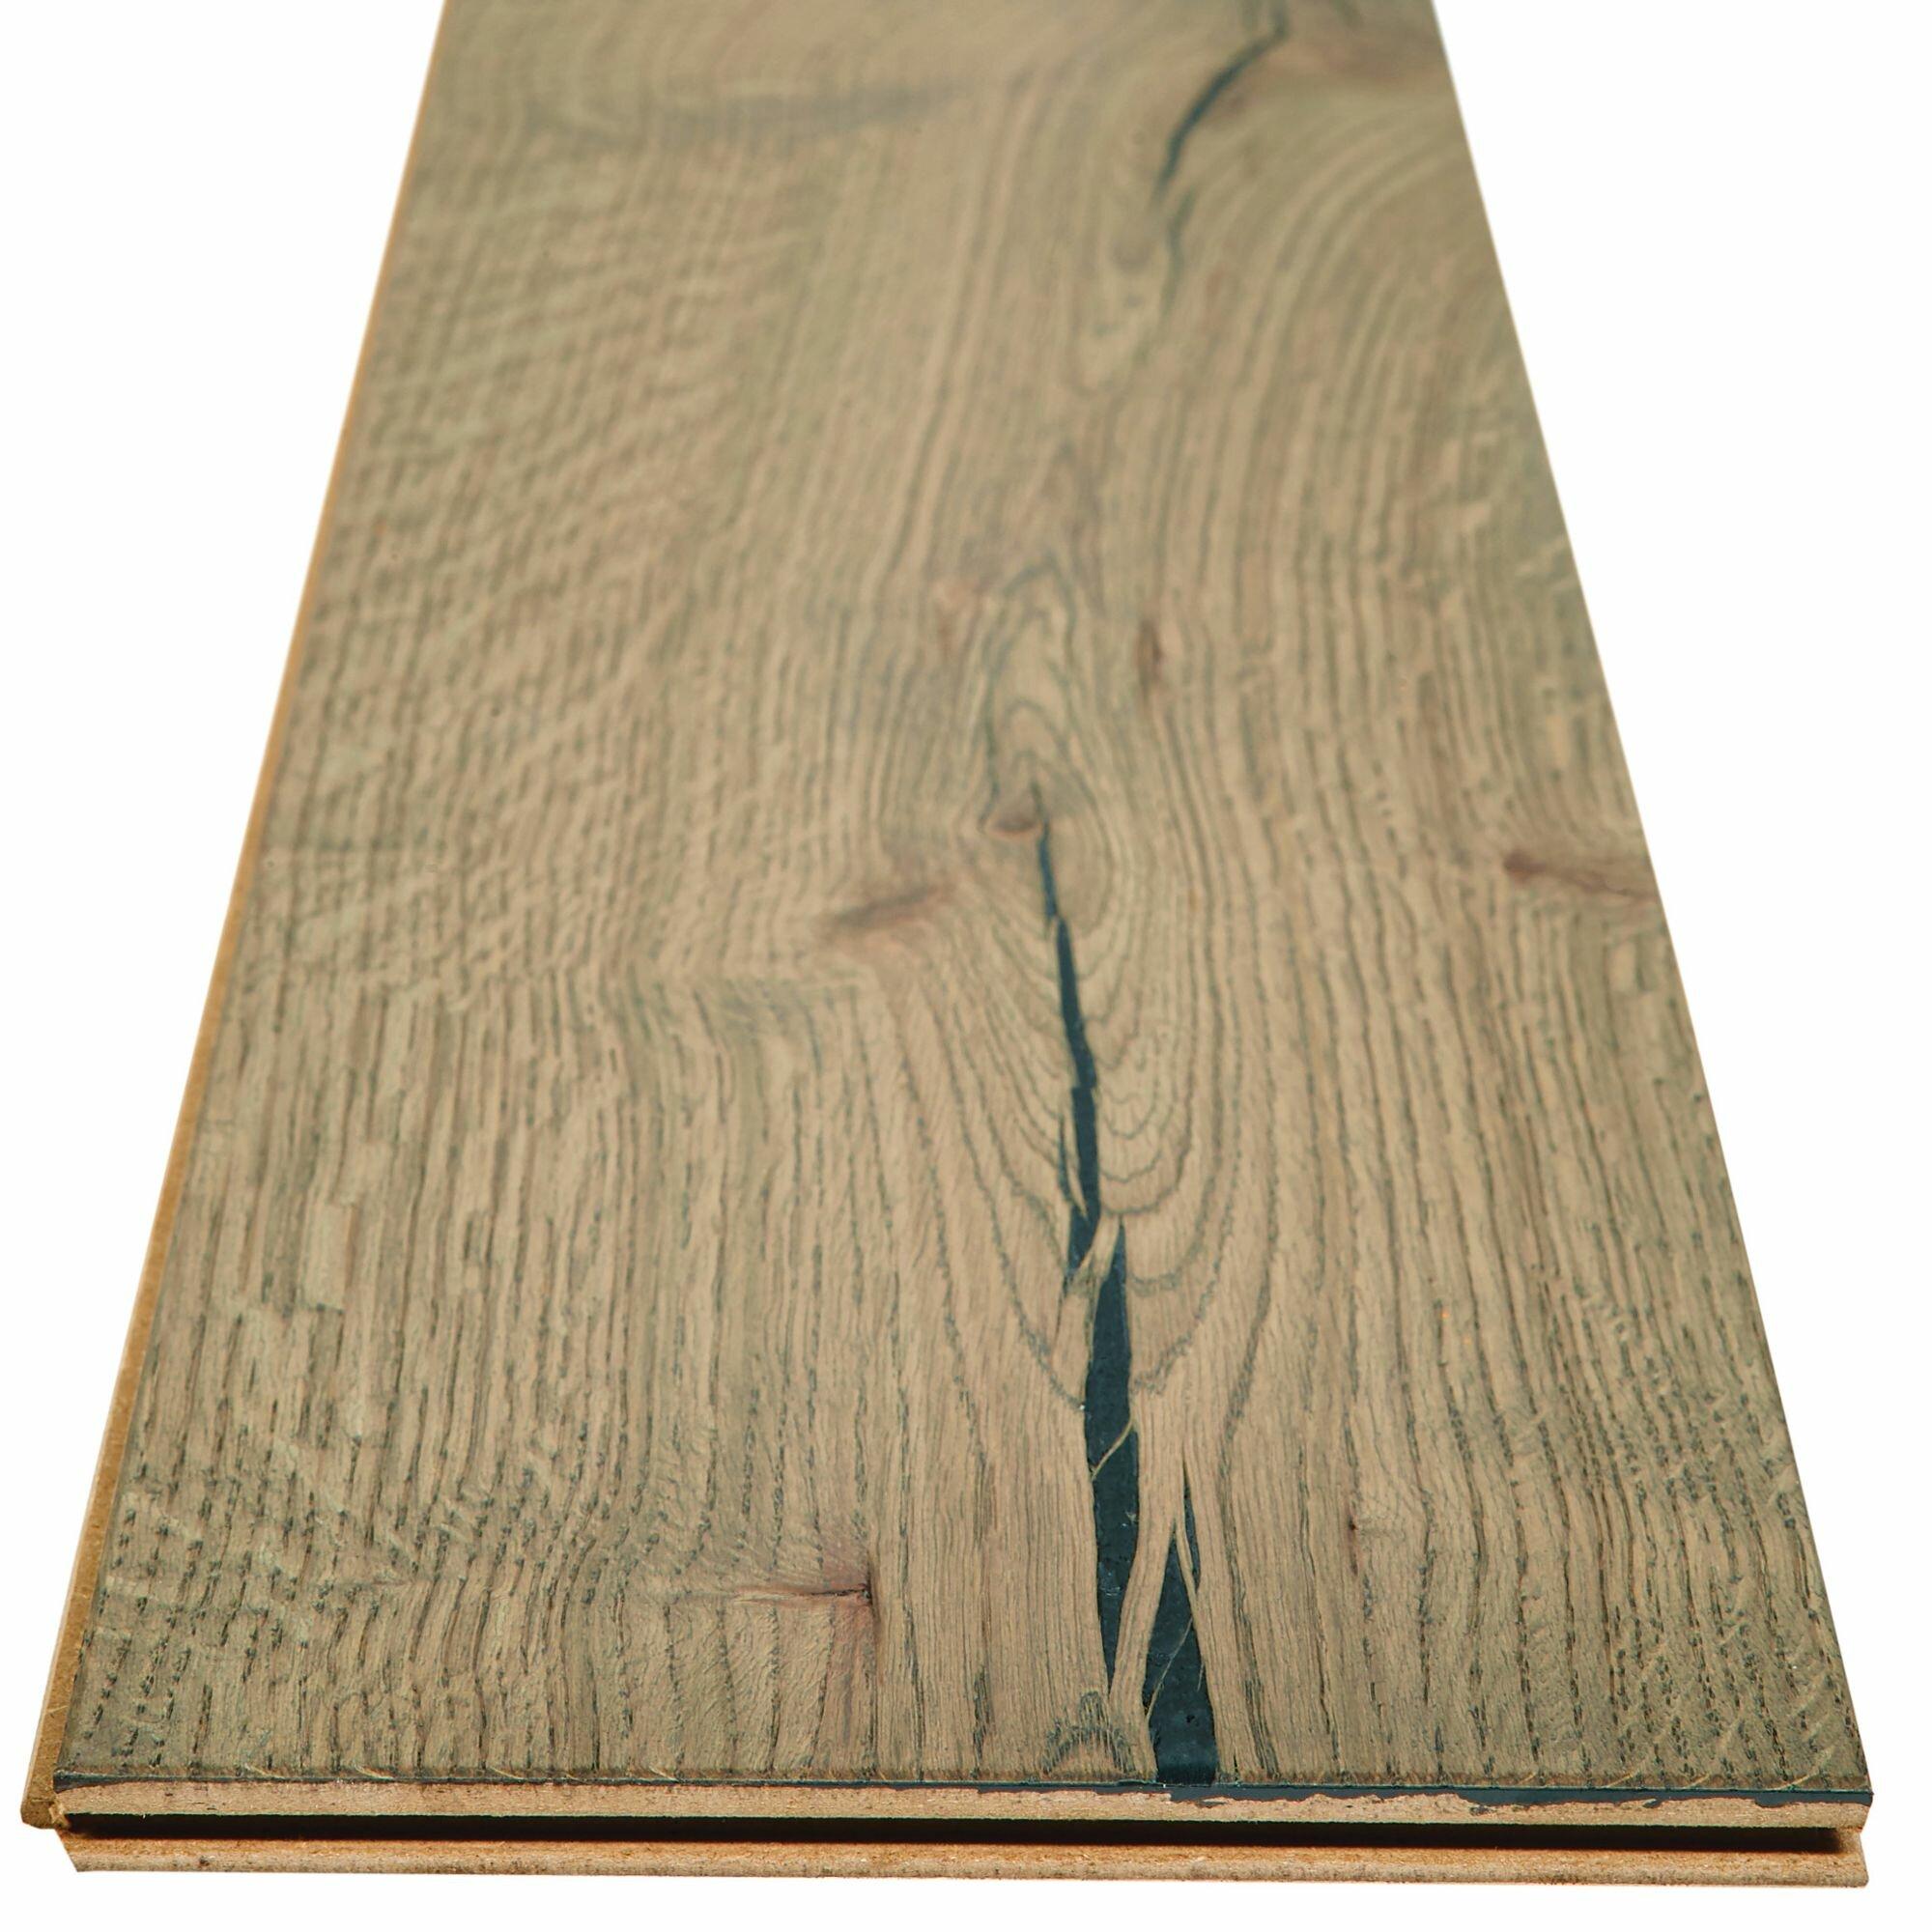 Shaw Floors Daydreamer Oak 1 2 Thick X